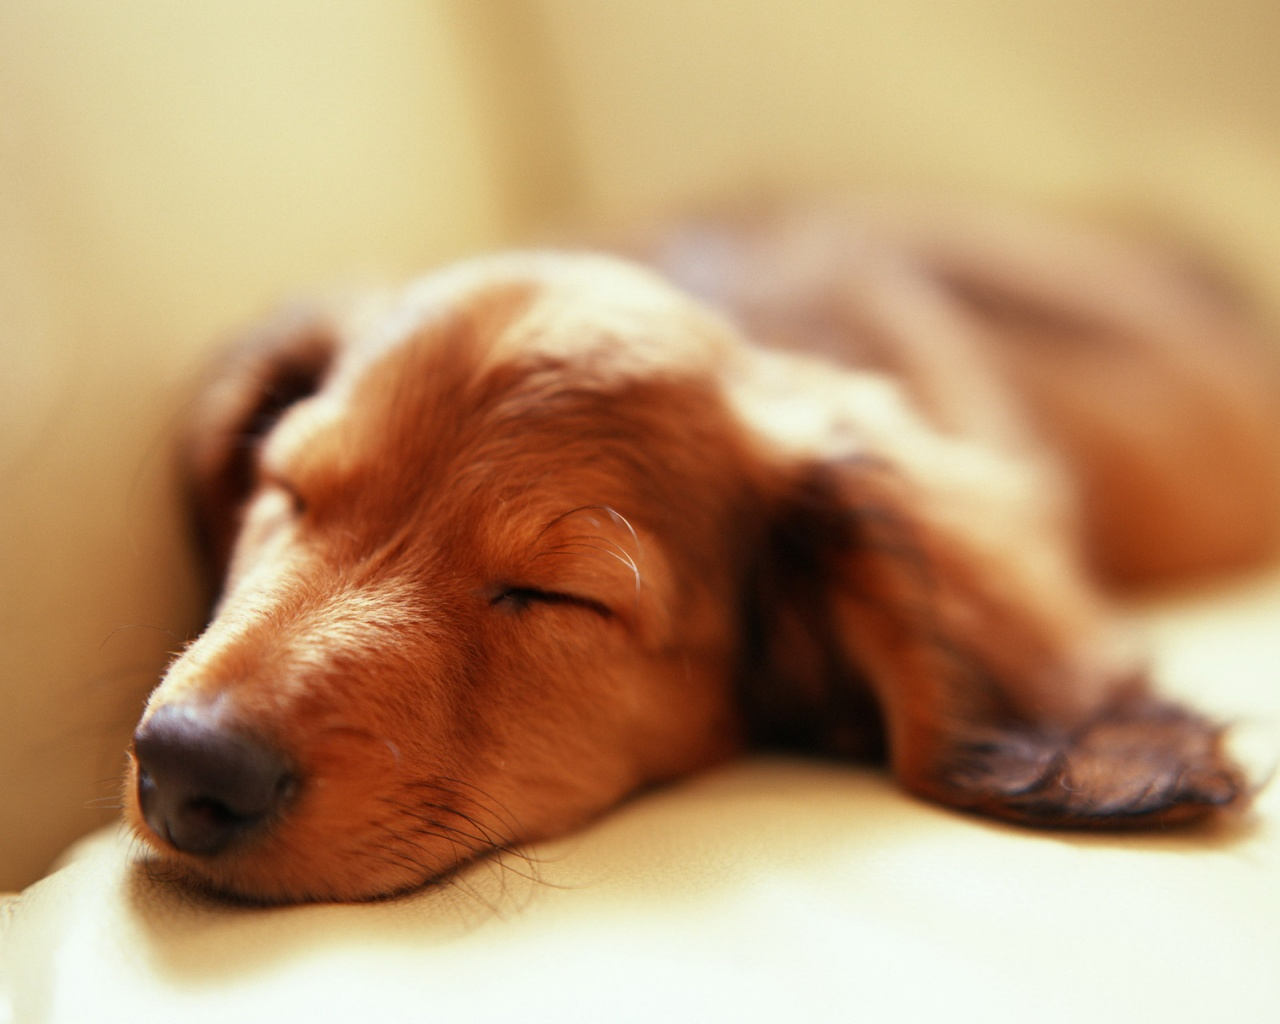 1280x1024 Sleeping dog desktop PC and Mac wallpaper 1280x1024